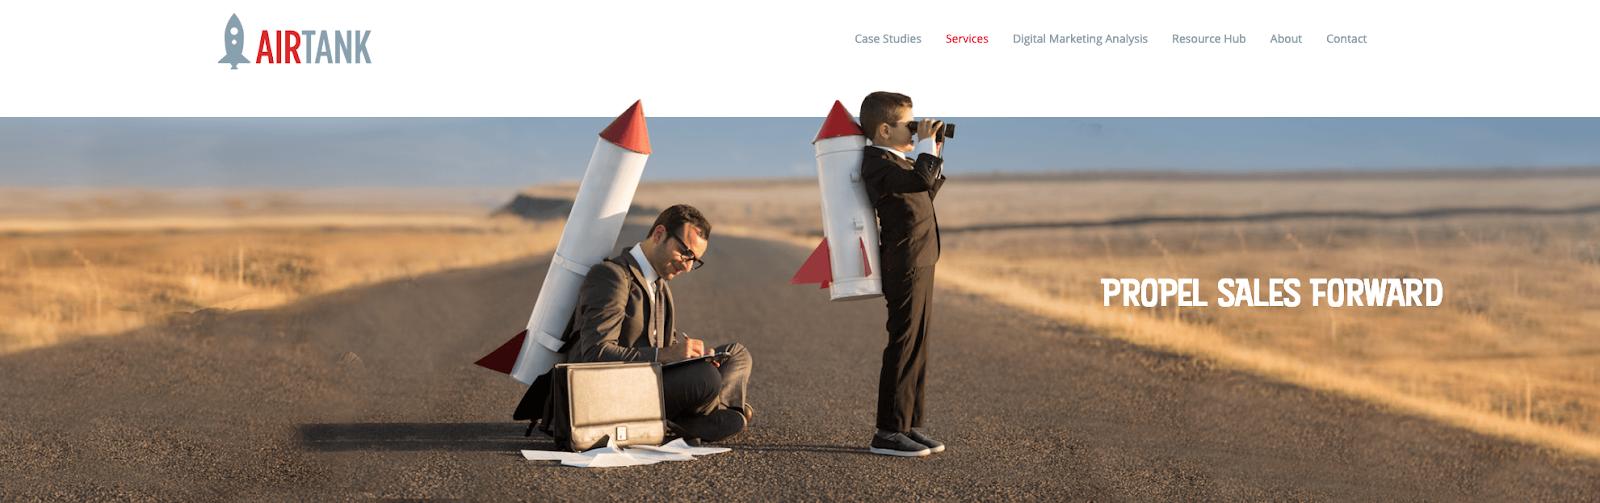 Screenshot of Airtank homepage